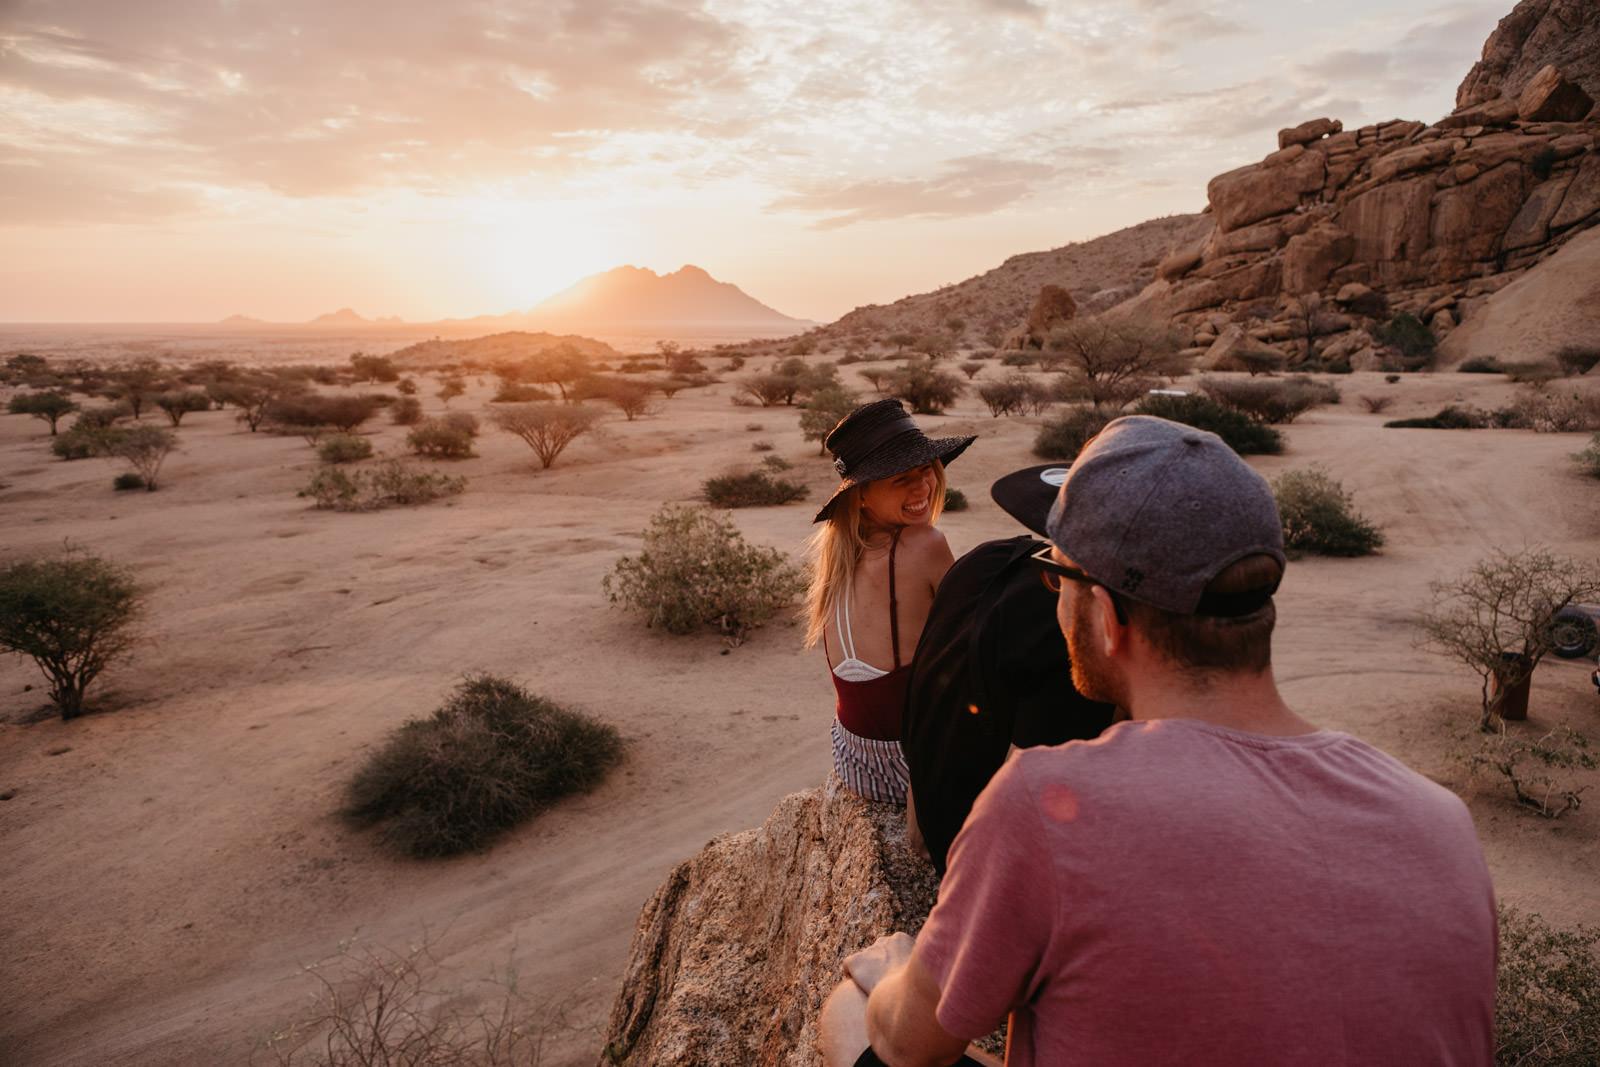 namibia_trip_rooftent_camping_roadtrip (13 von 18).jpg